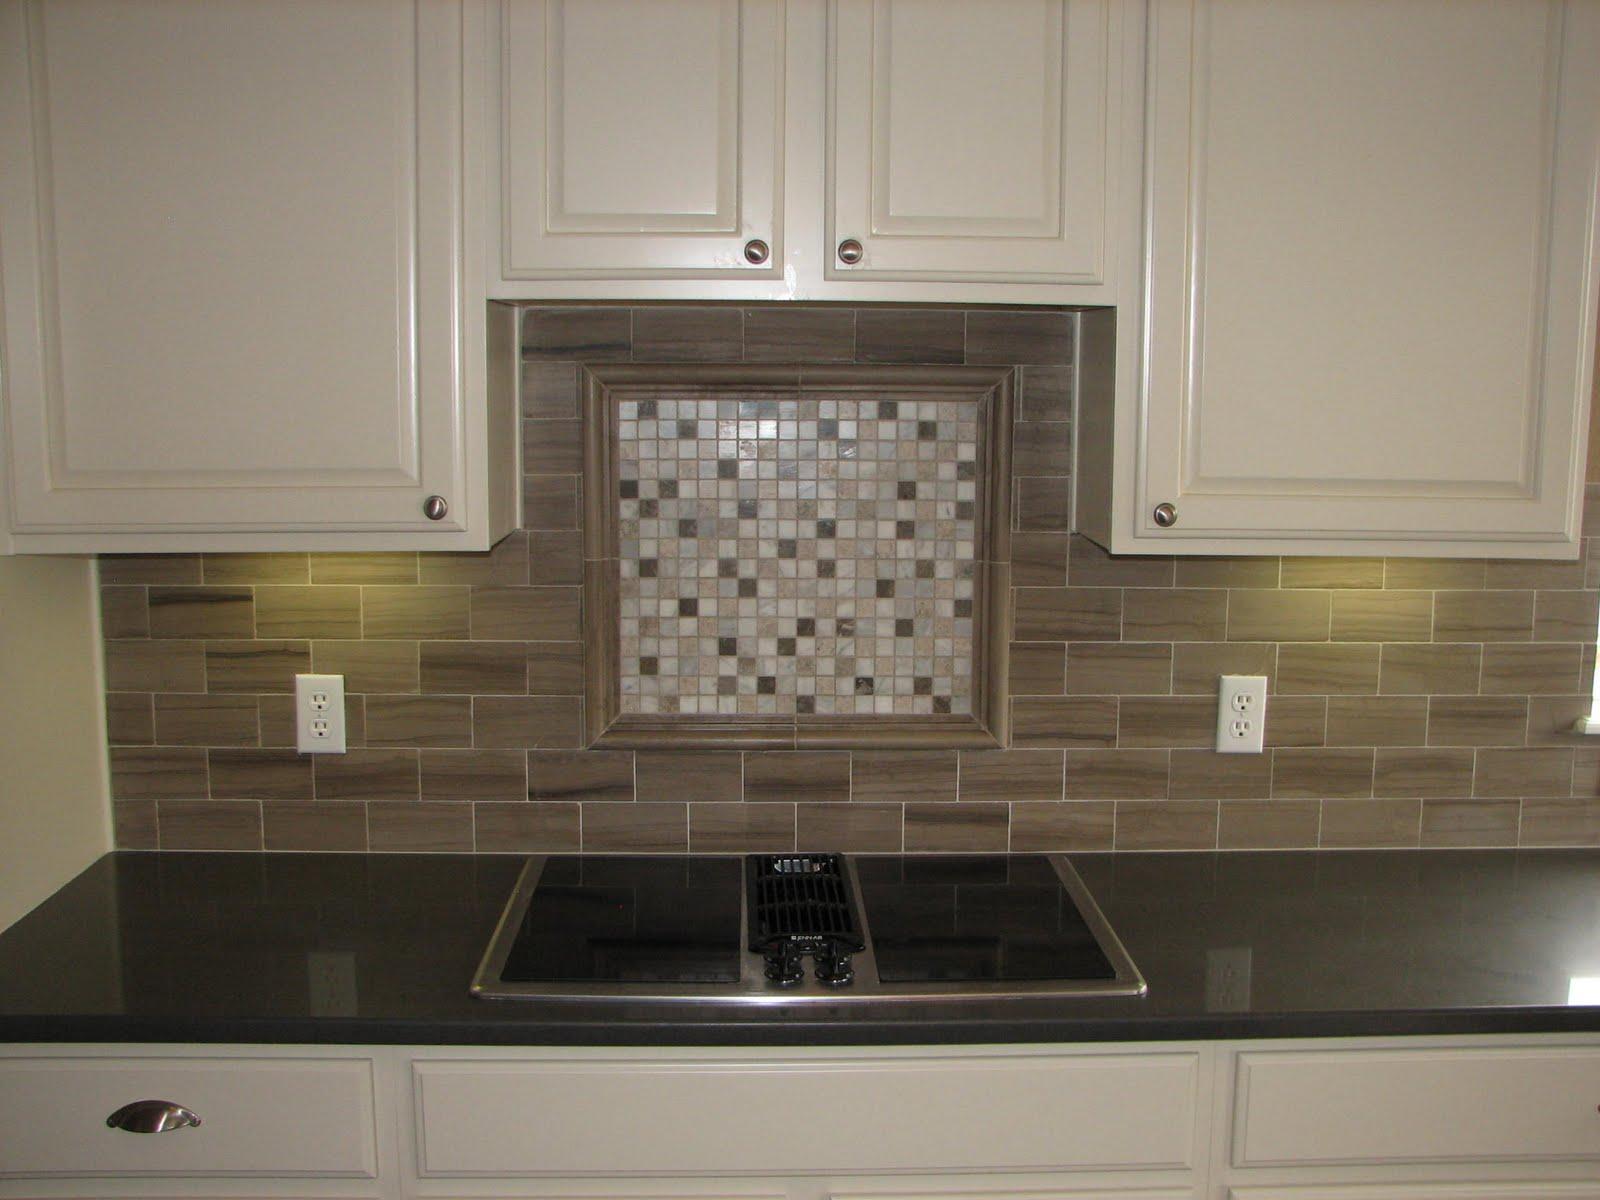 ... design tile design backsplash photos backsplash design tile backsplash